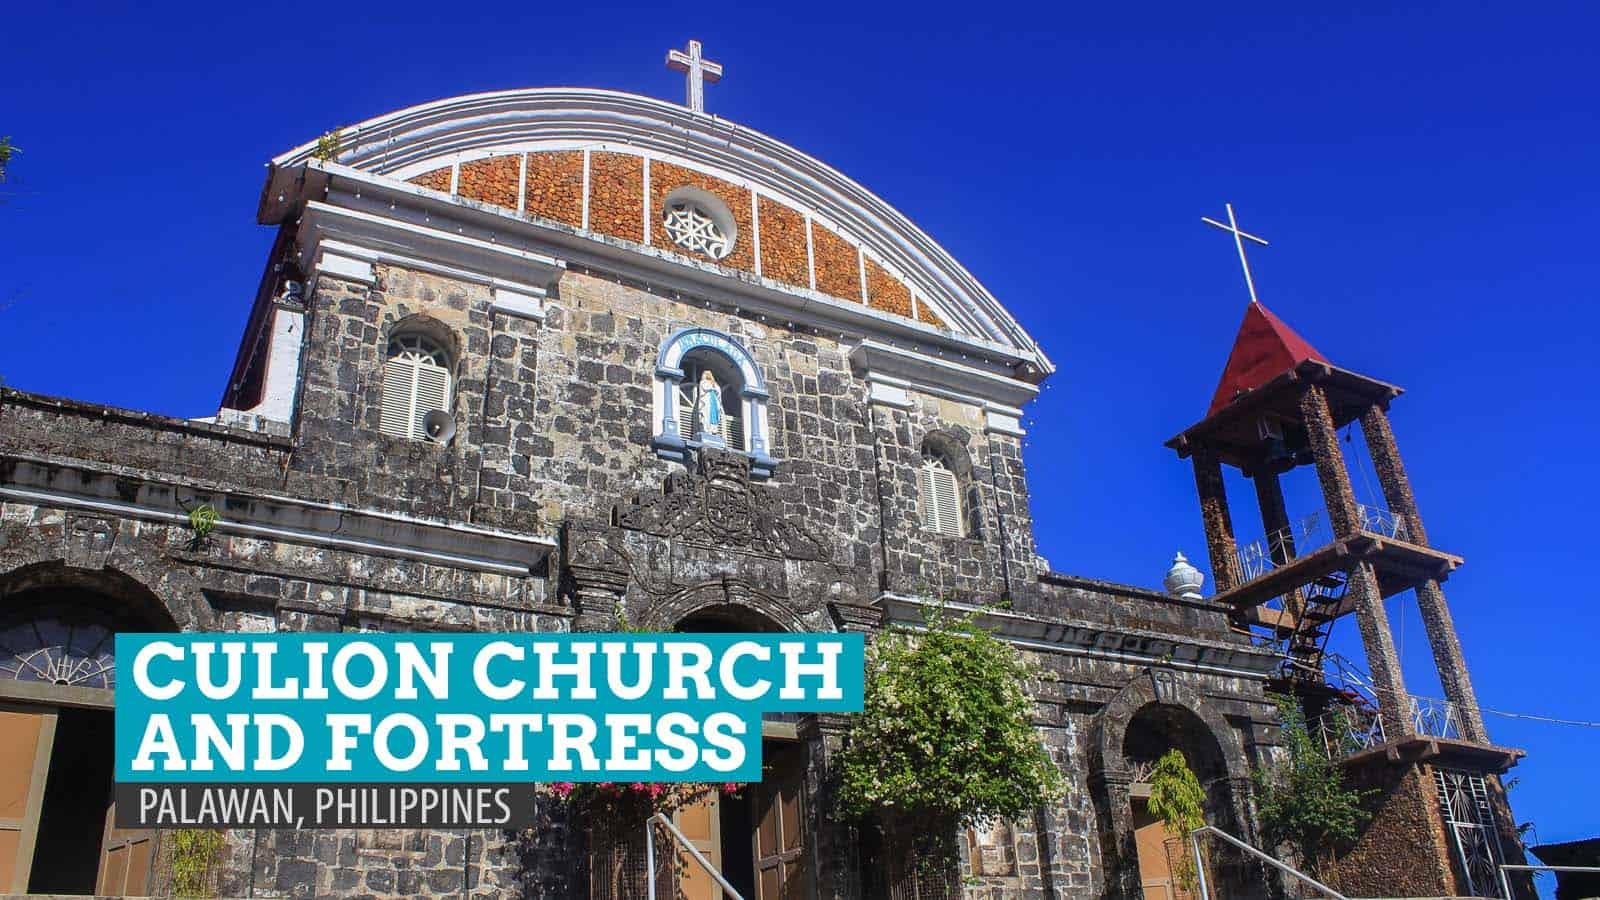 Sunrise at Culion Church and Fortress, Palawan